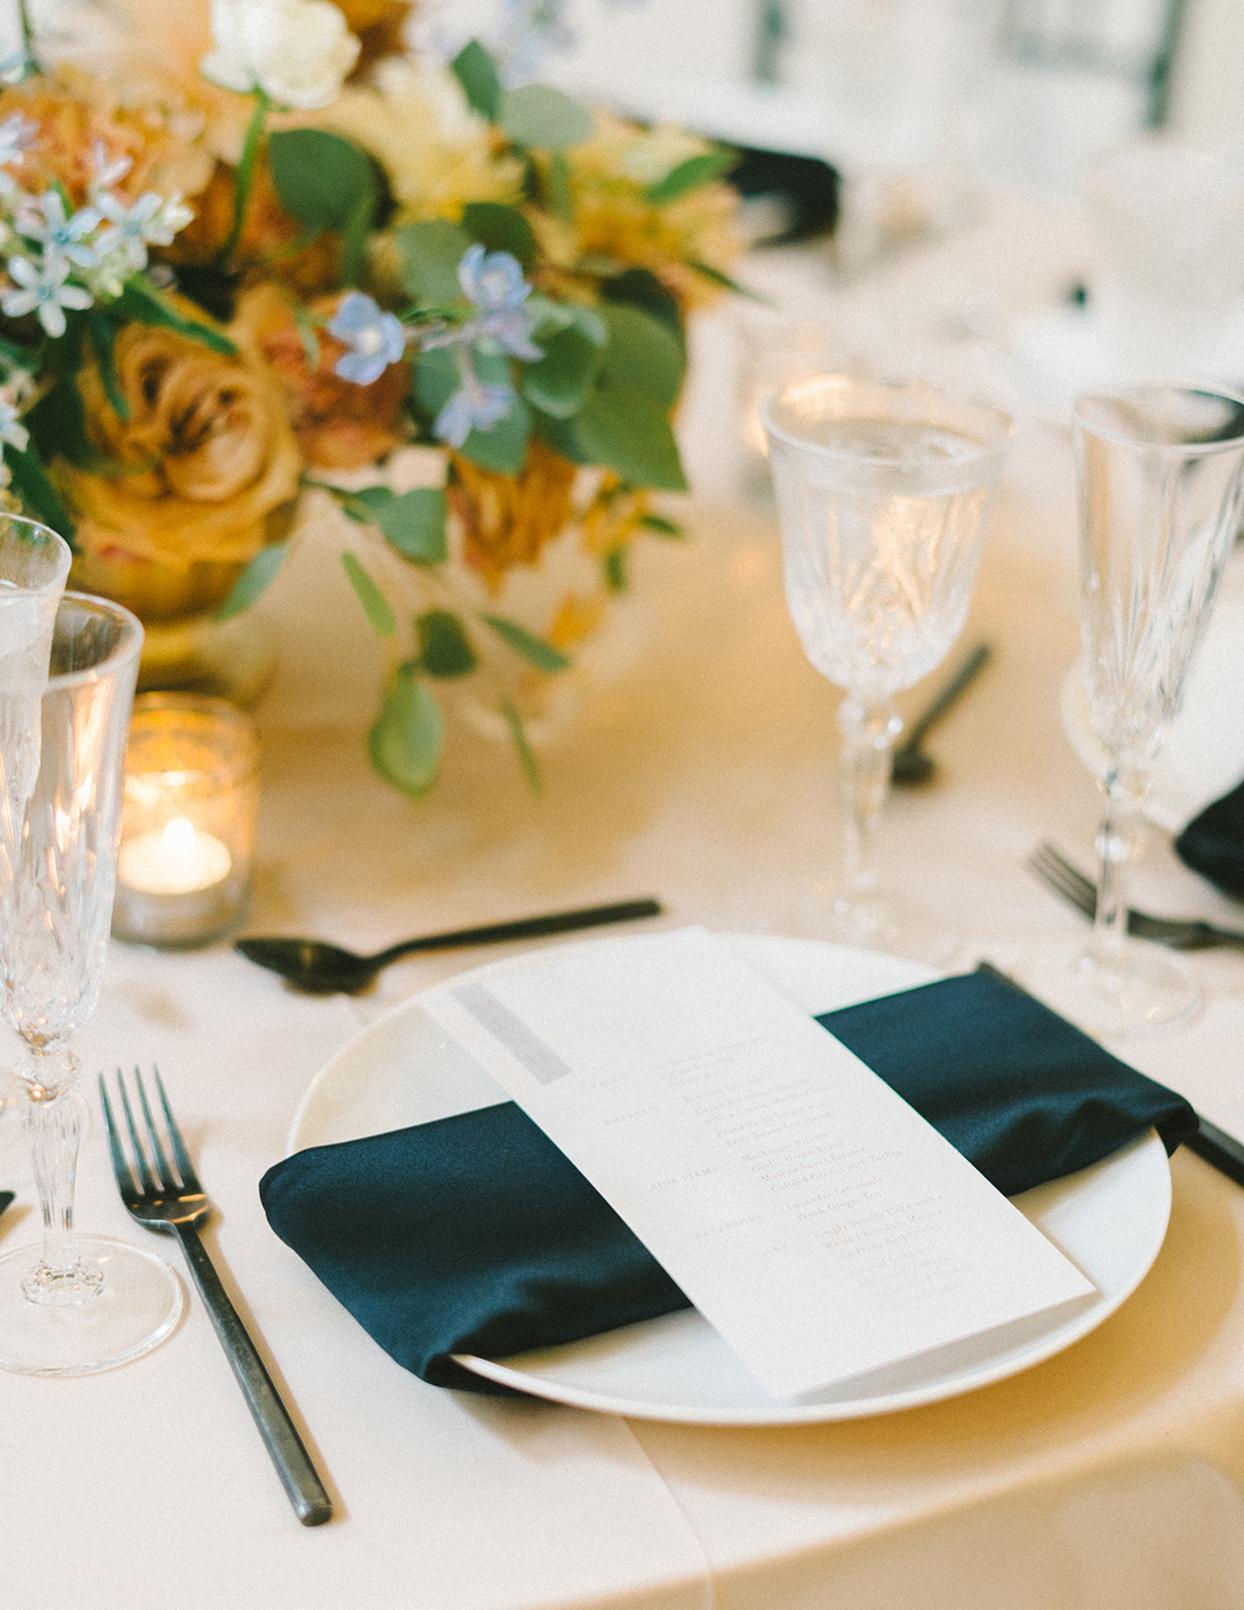 ericka meechaeyl wedding place setting at table